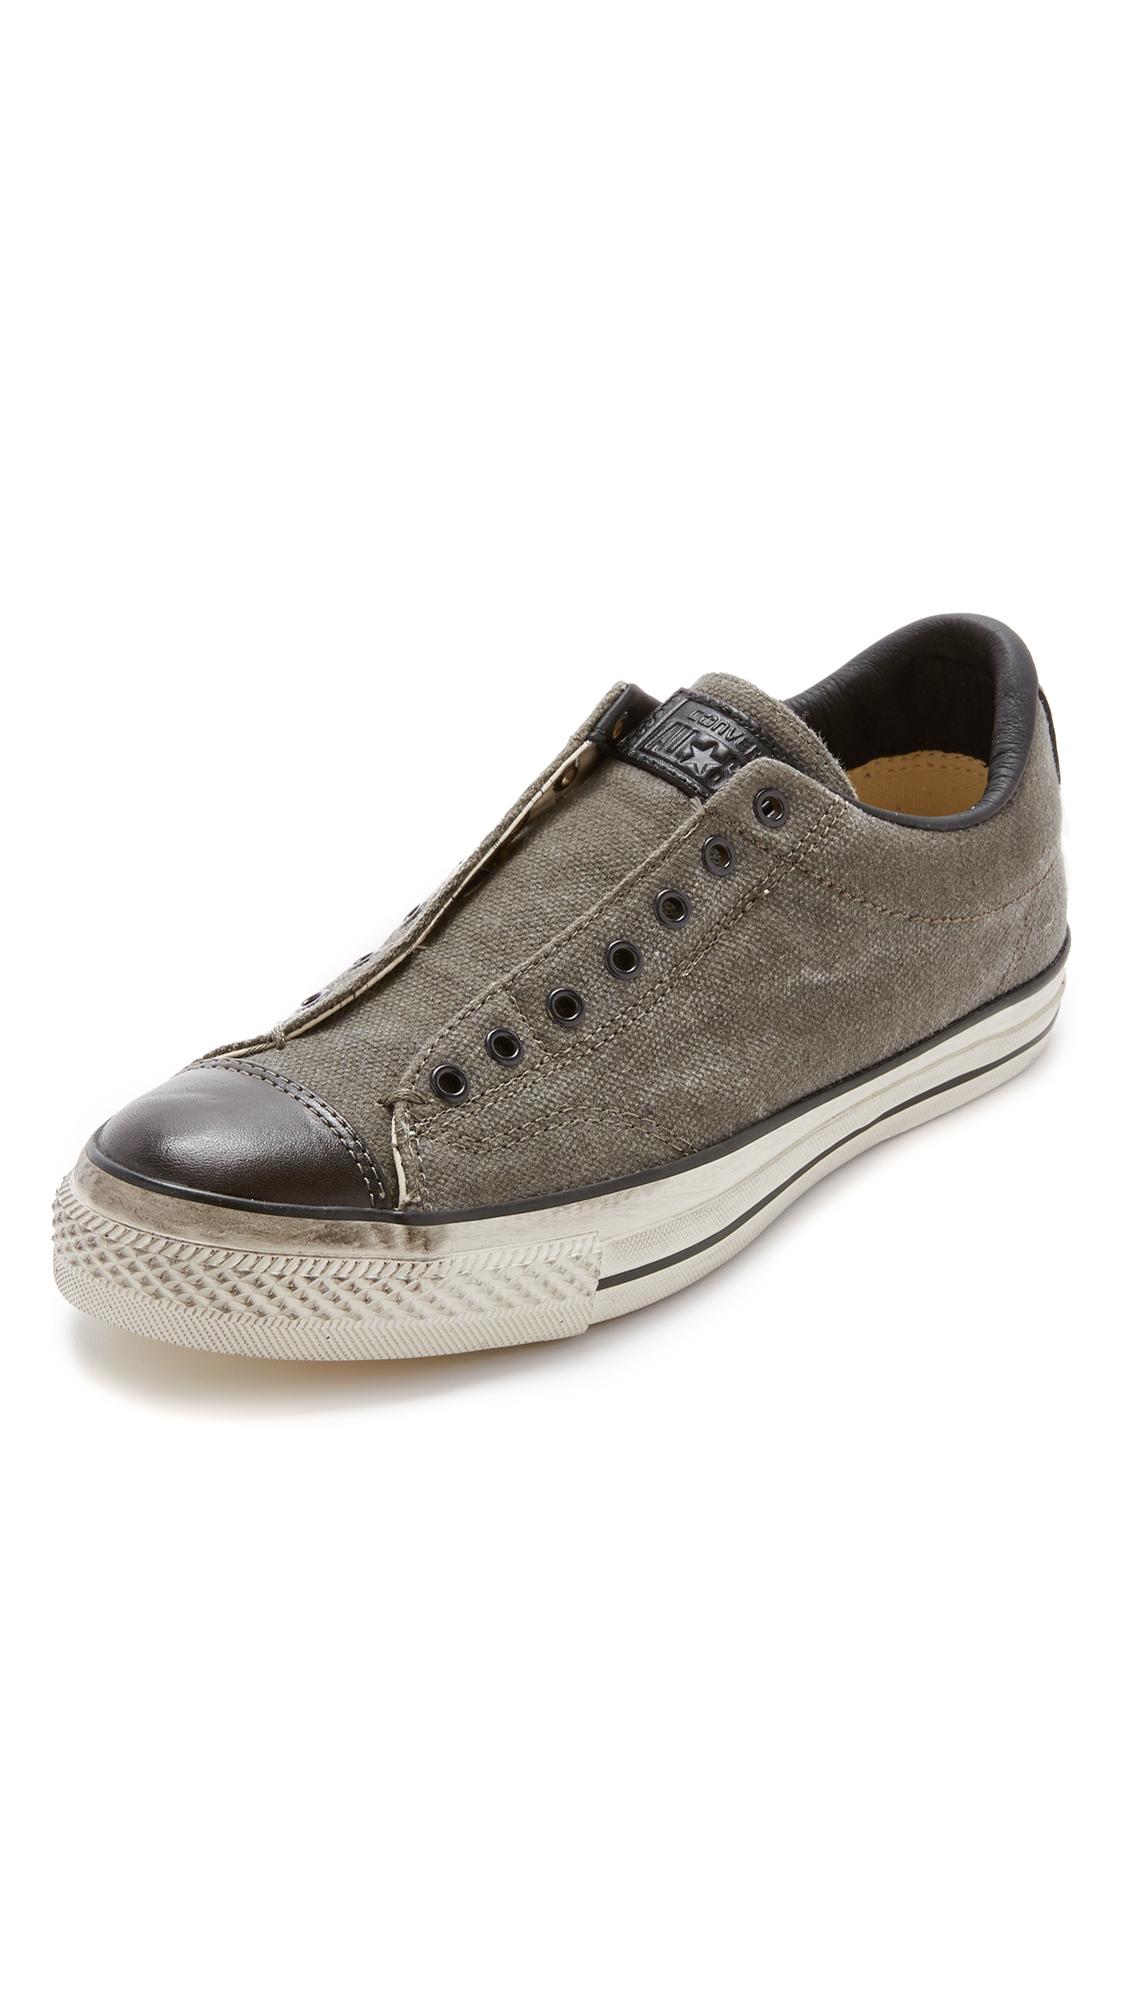 deccfdd0971315 Lyst - Converse Chuck Taylor All Star Vintage Slip On Sneakers in ...